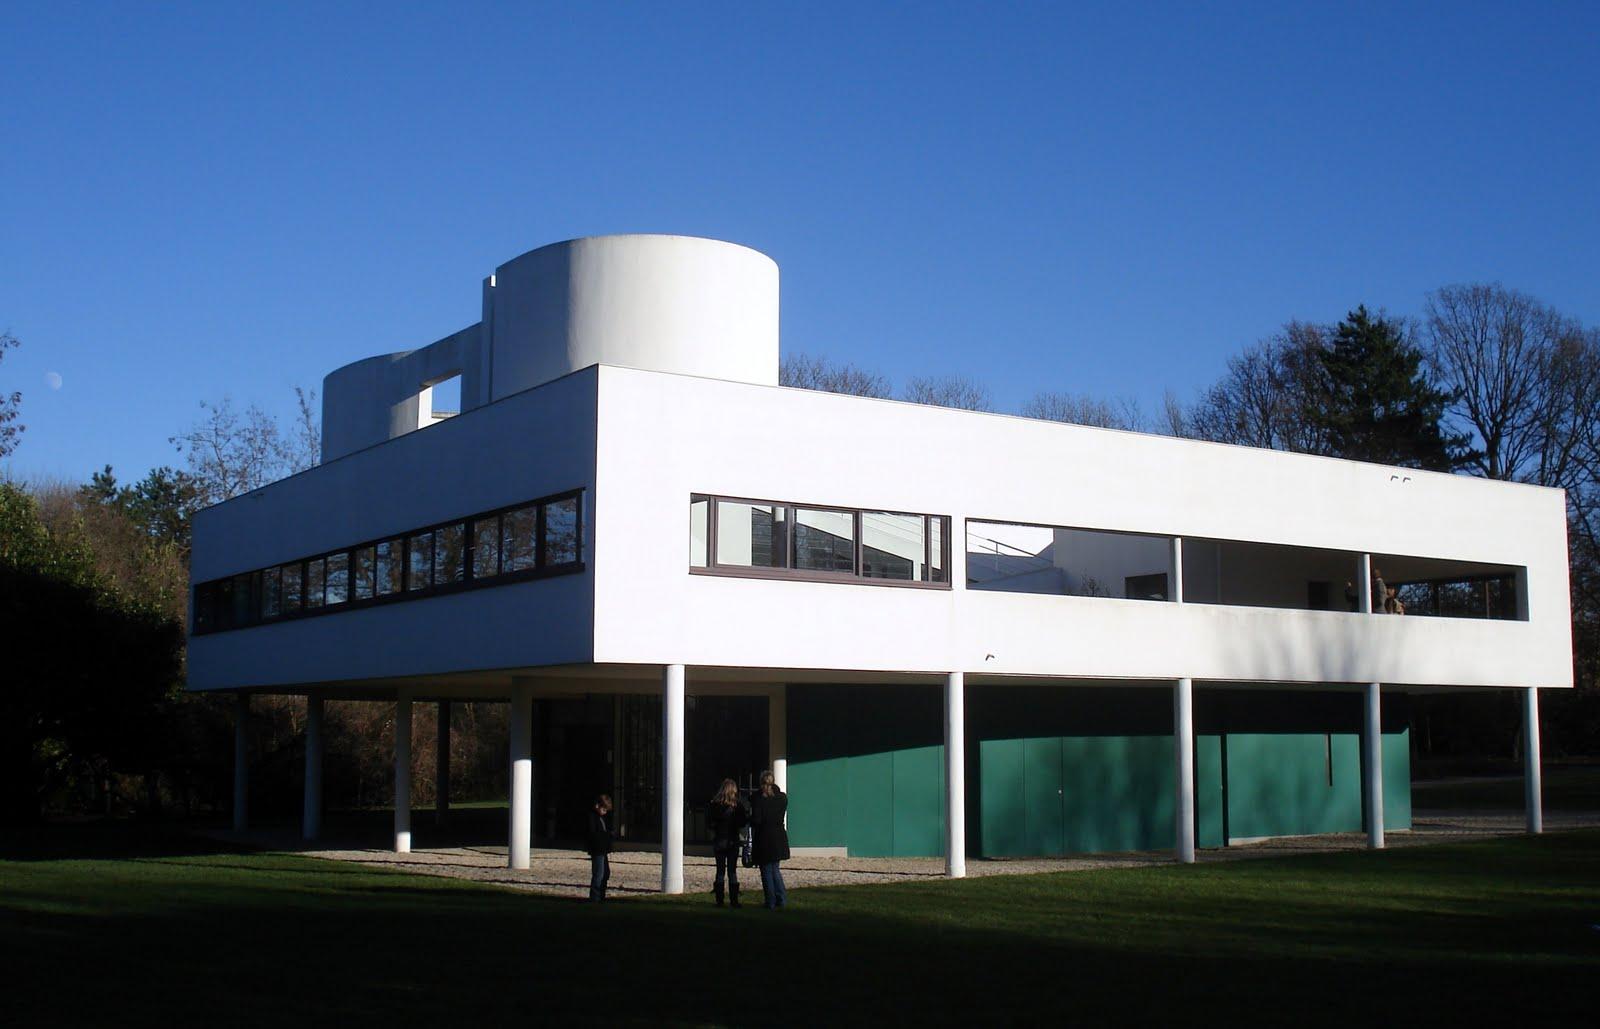 Kaki afonso arquitetura villa savoye le poissy fran a - Le corbusier casas ...